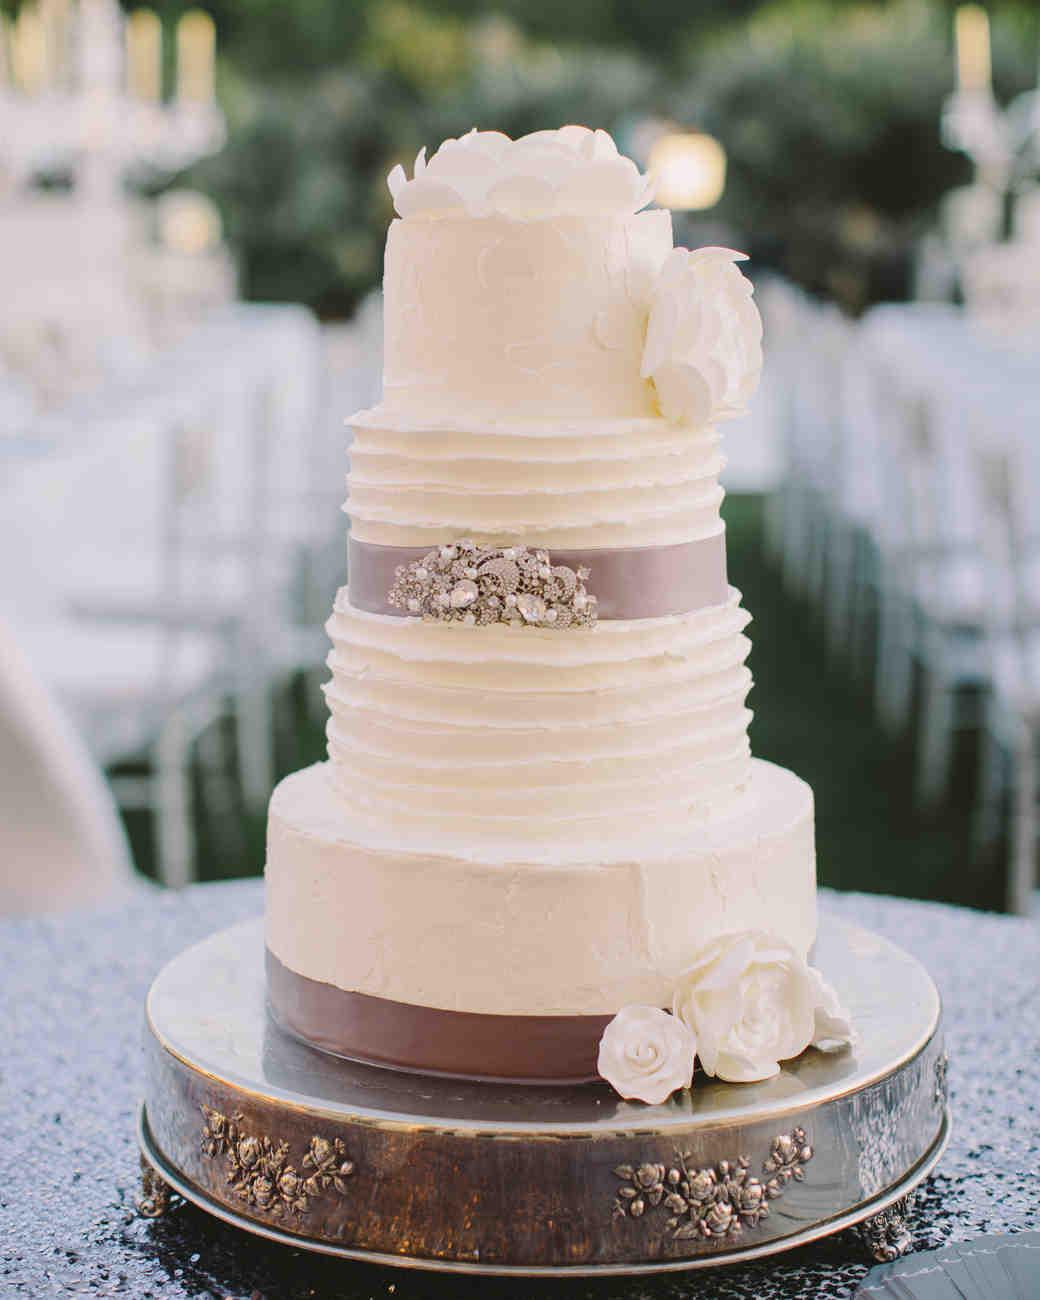 teresa-amanda-wedding-cake-0145-s111694-1114.jpg